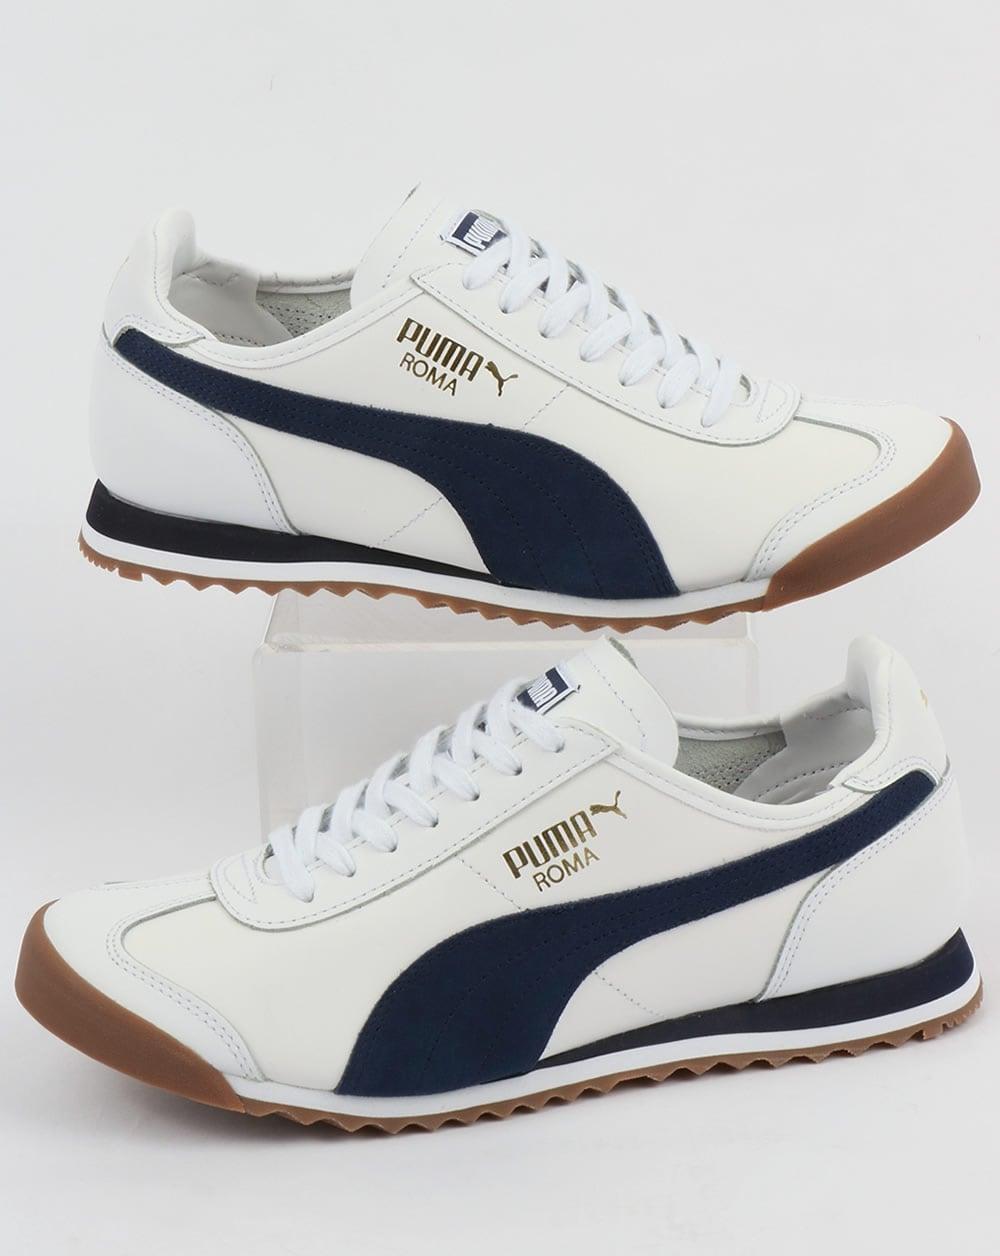 puma sneakers 80s